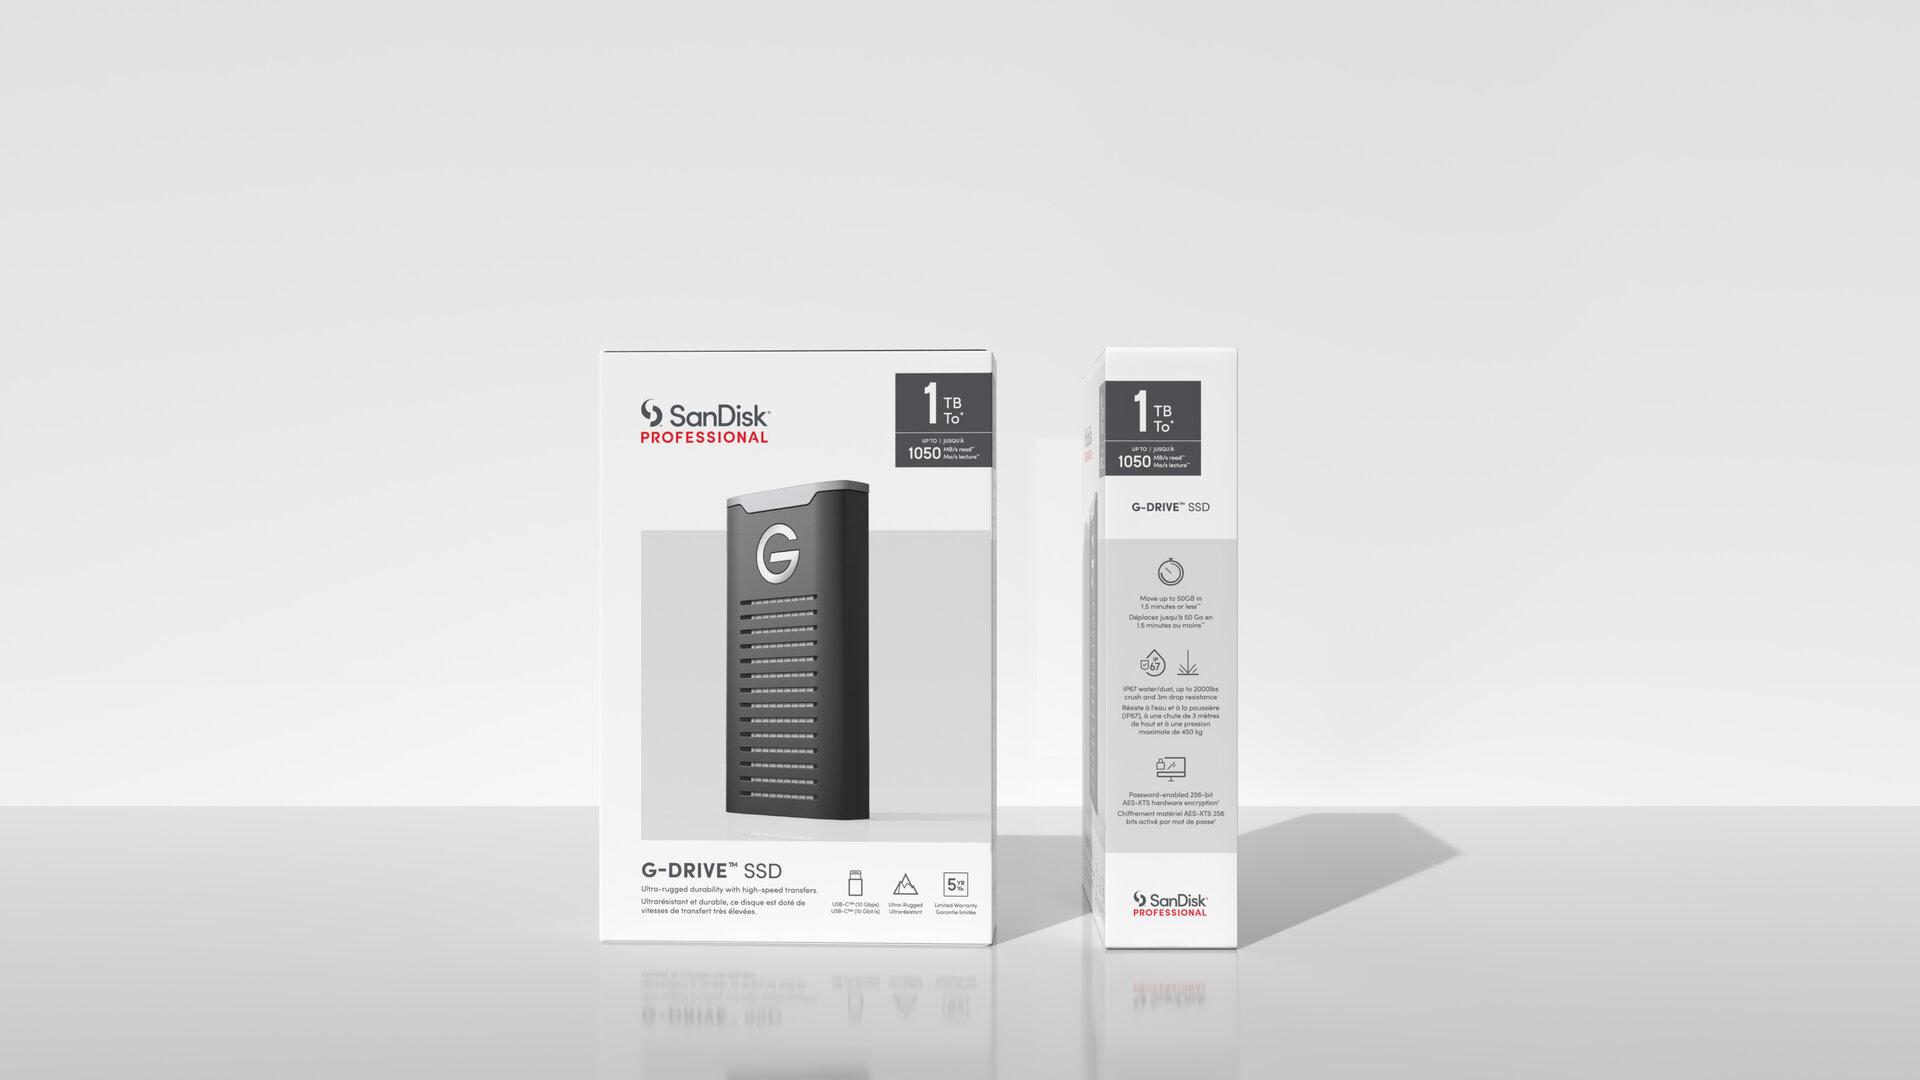 SanDisk Professional G-Drive SSD